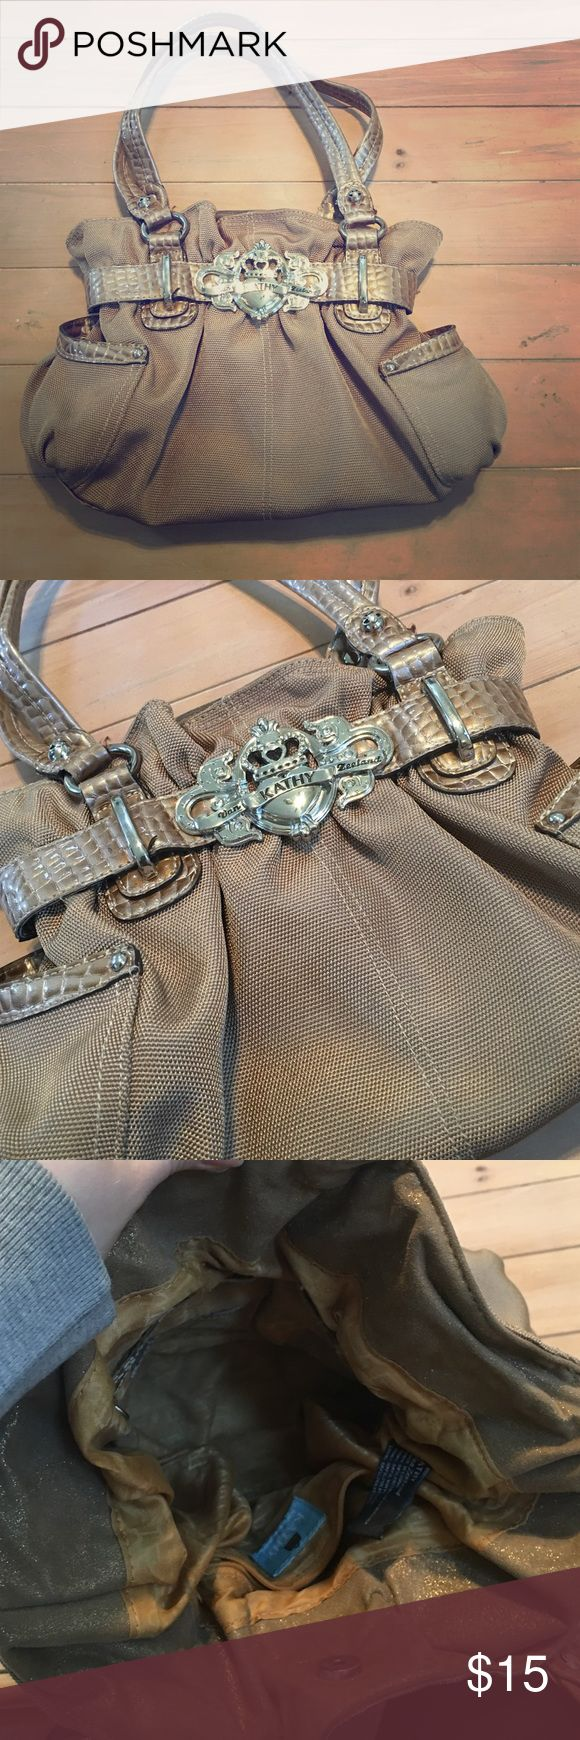 Kathy Van Zeeland Purse 👛 Kathy Van Zeeland Purse 👛 Neutral Color 💕 Magnetic closure 💕 Make an offer!! Kathy Van Zeeland Bags